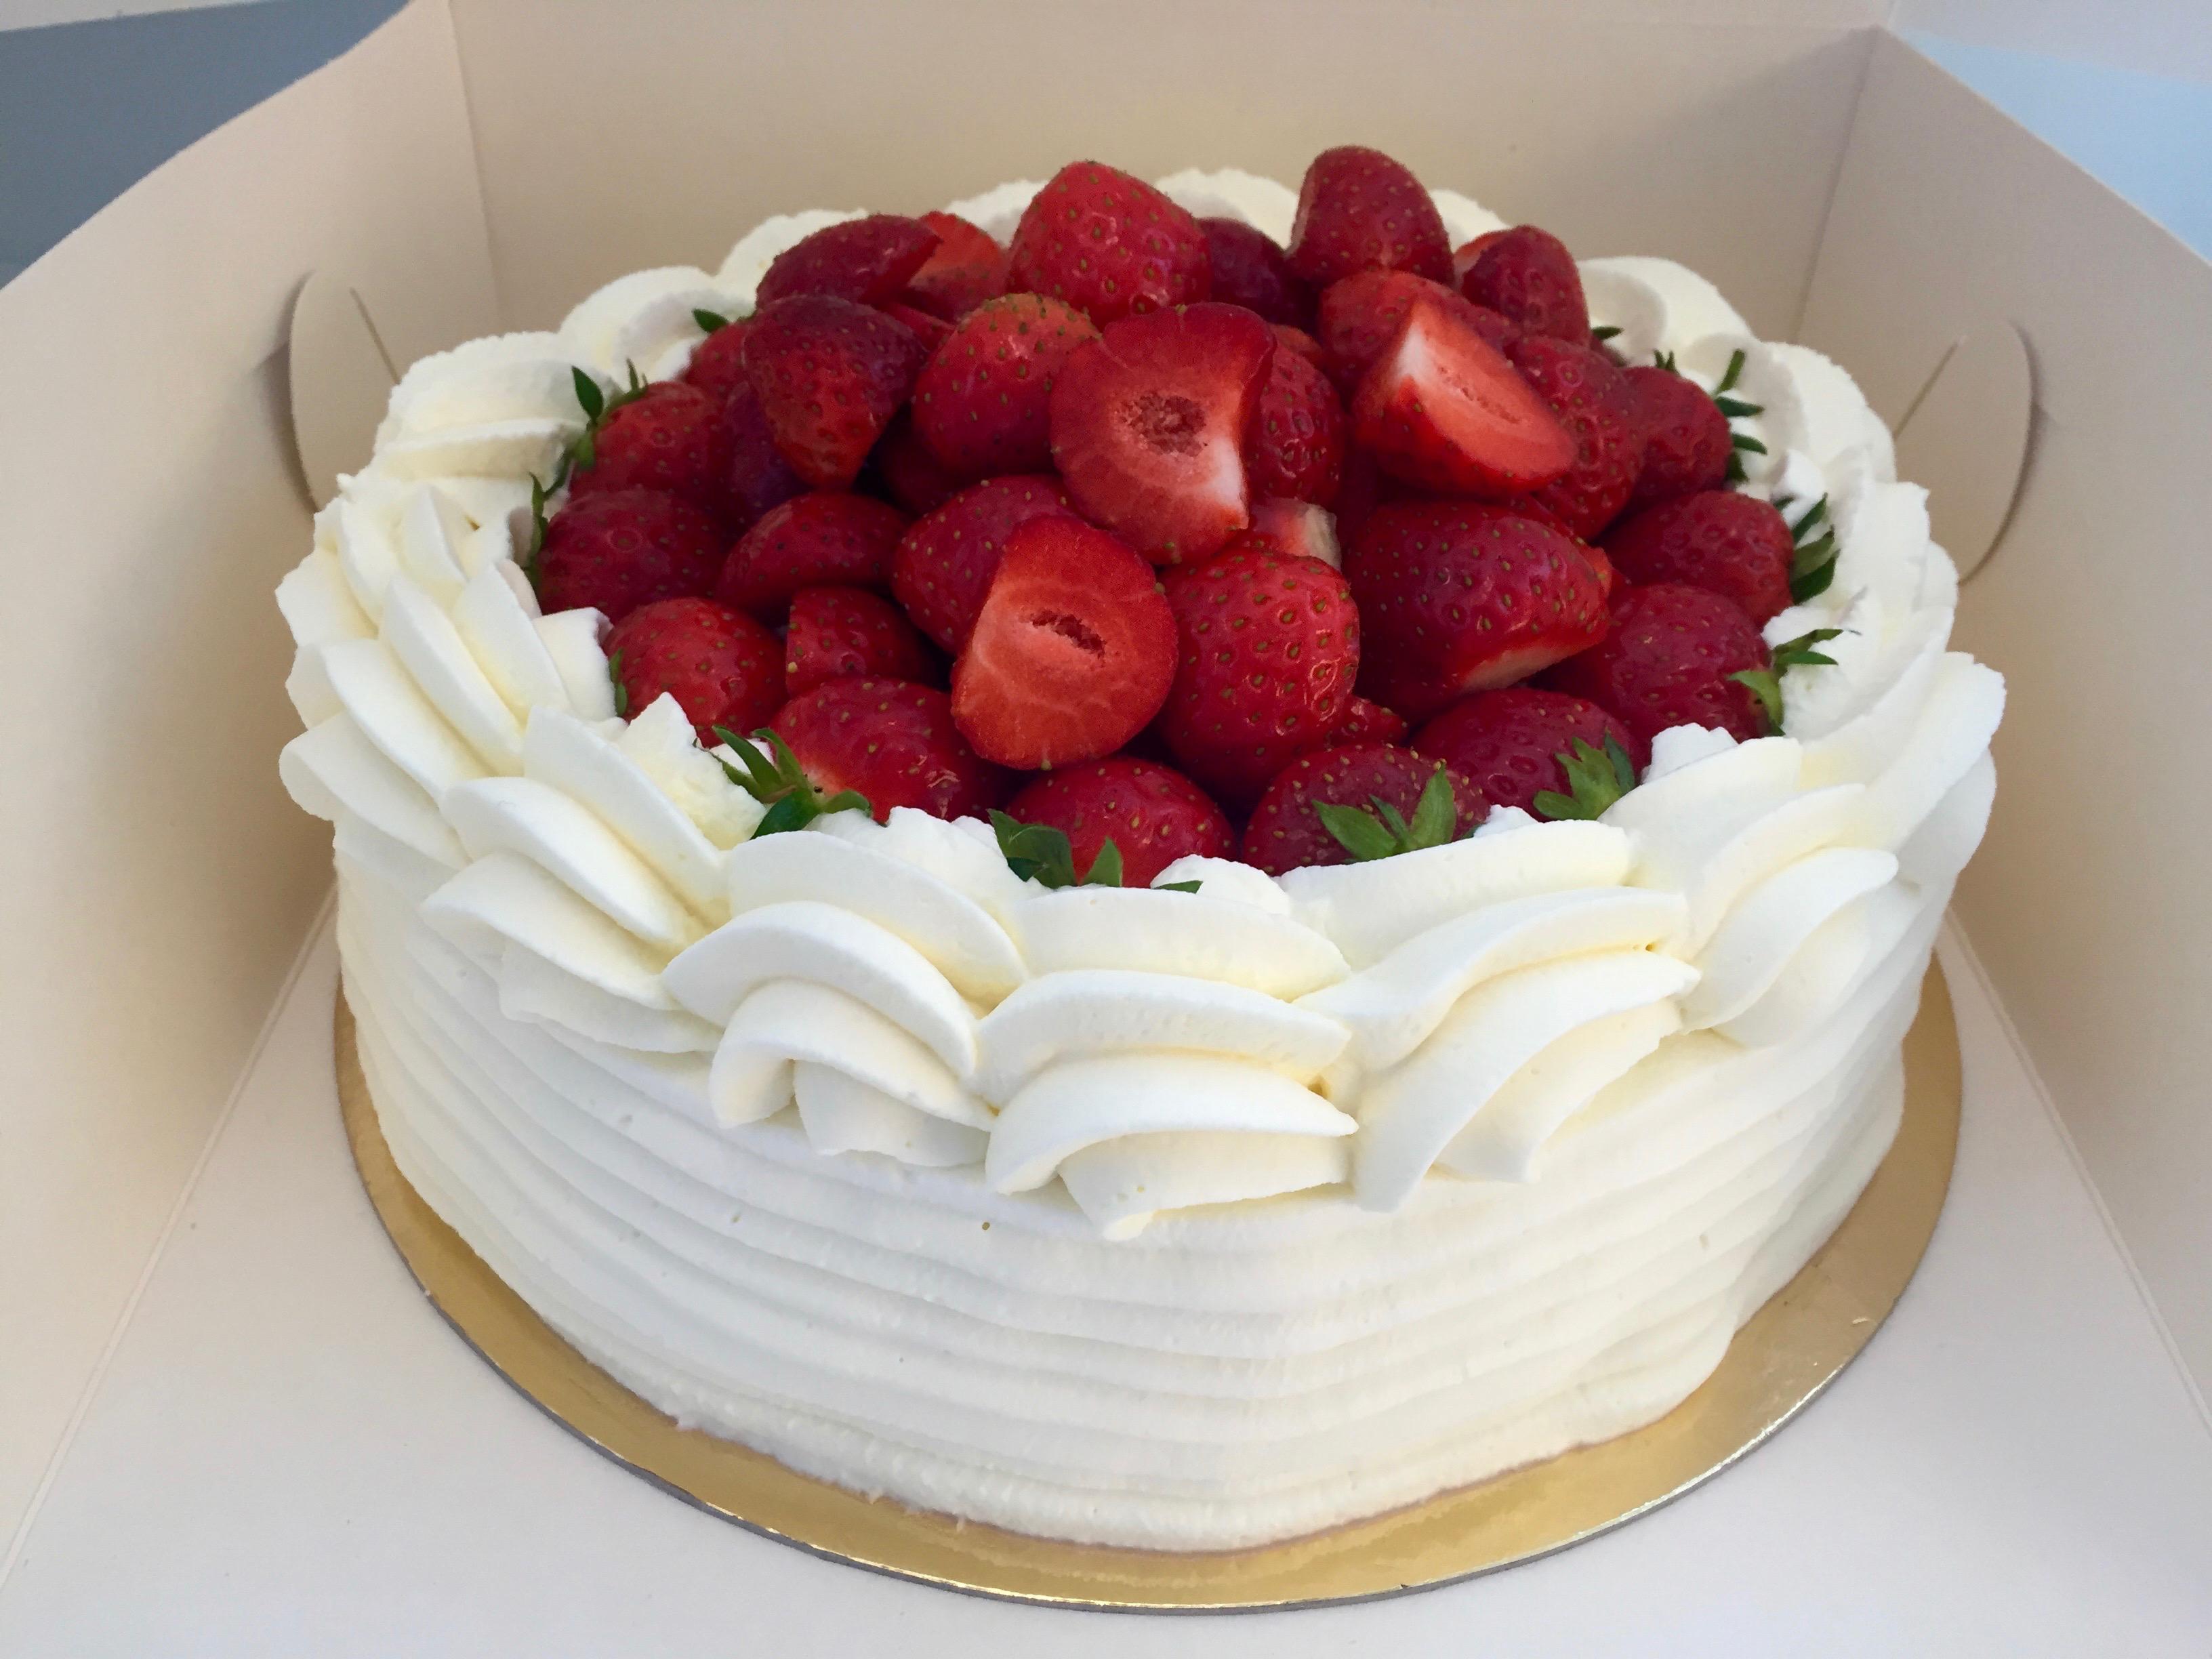 gelatin till tårta